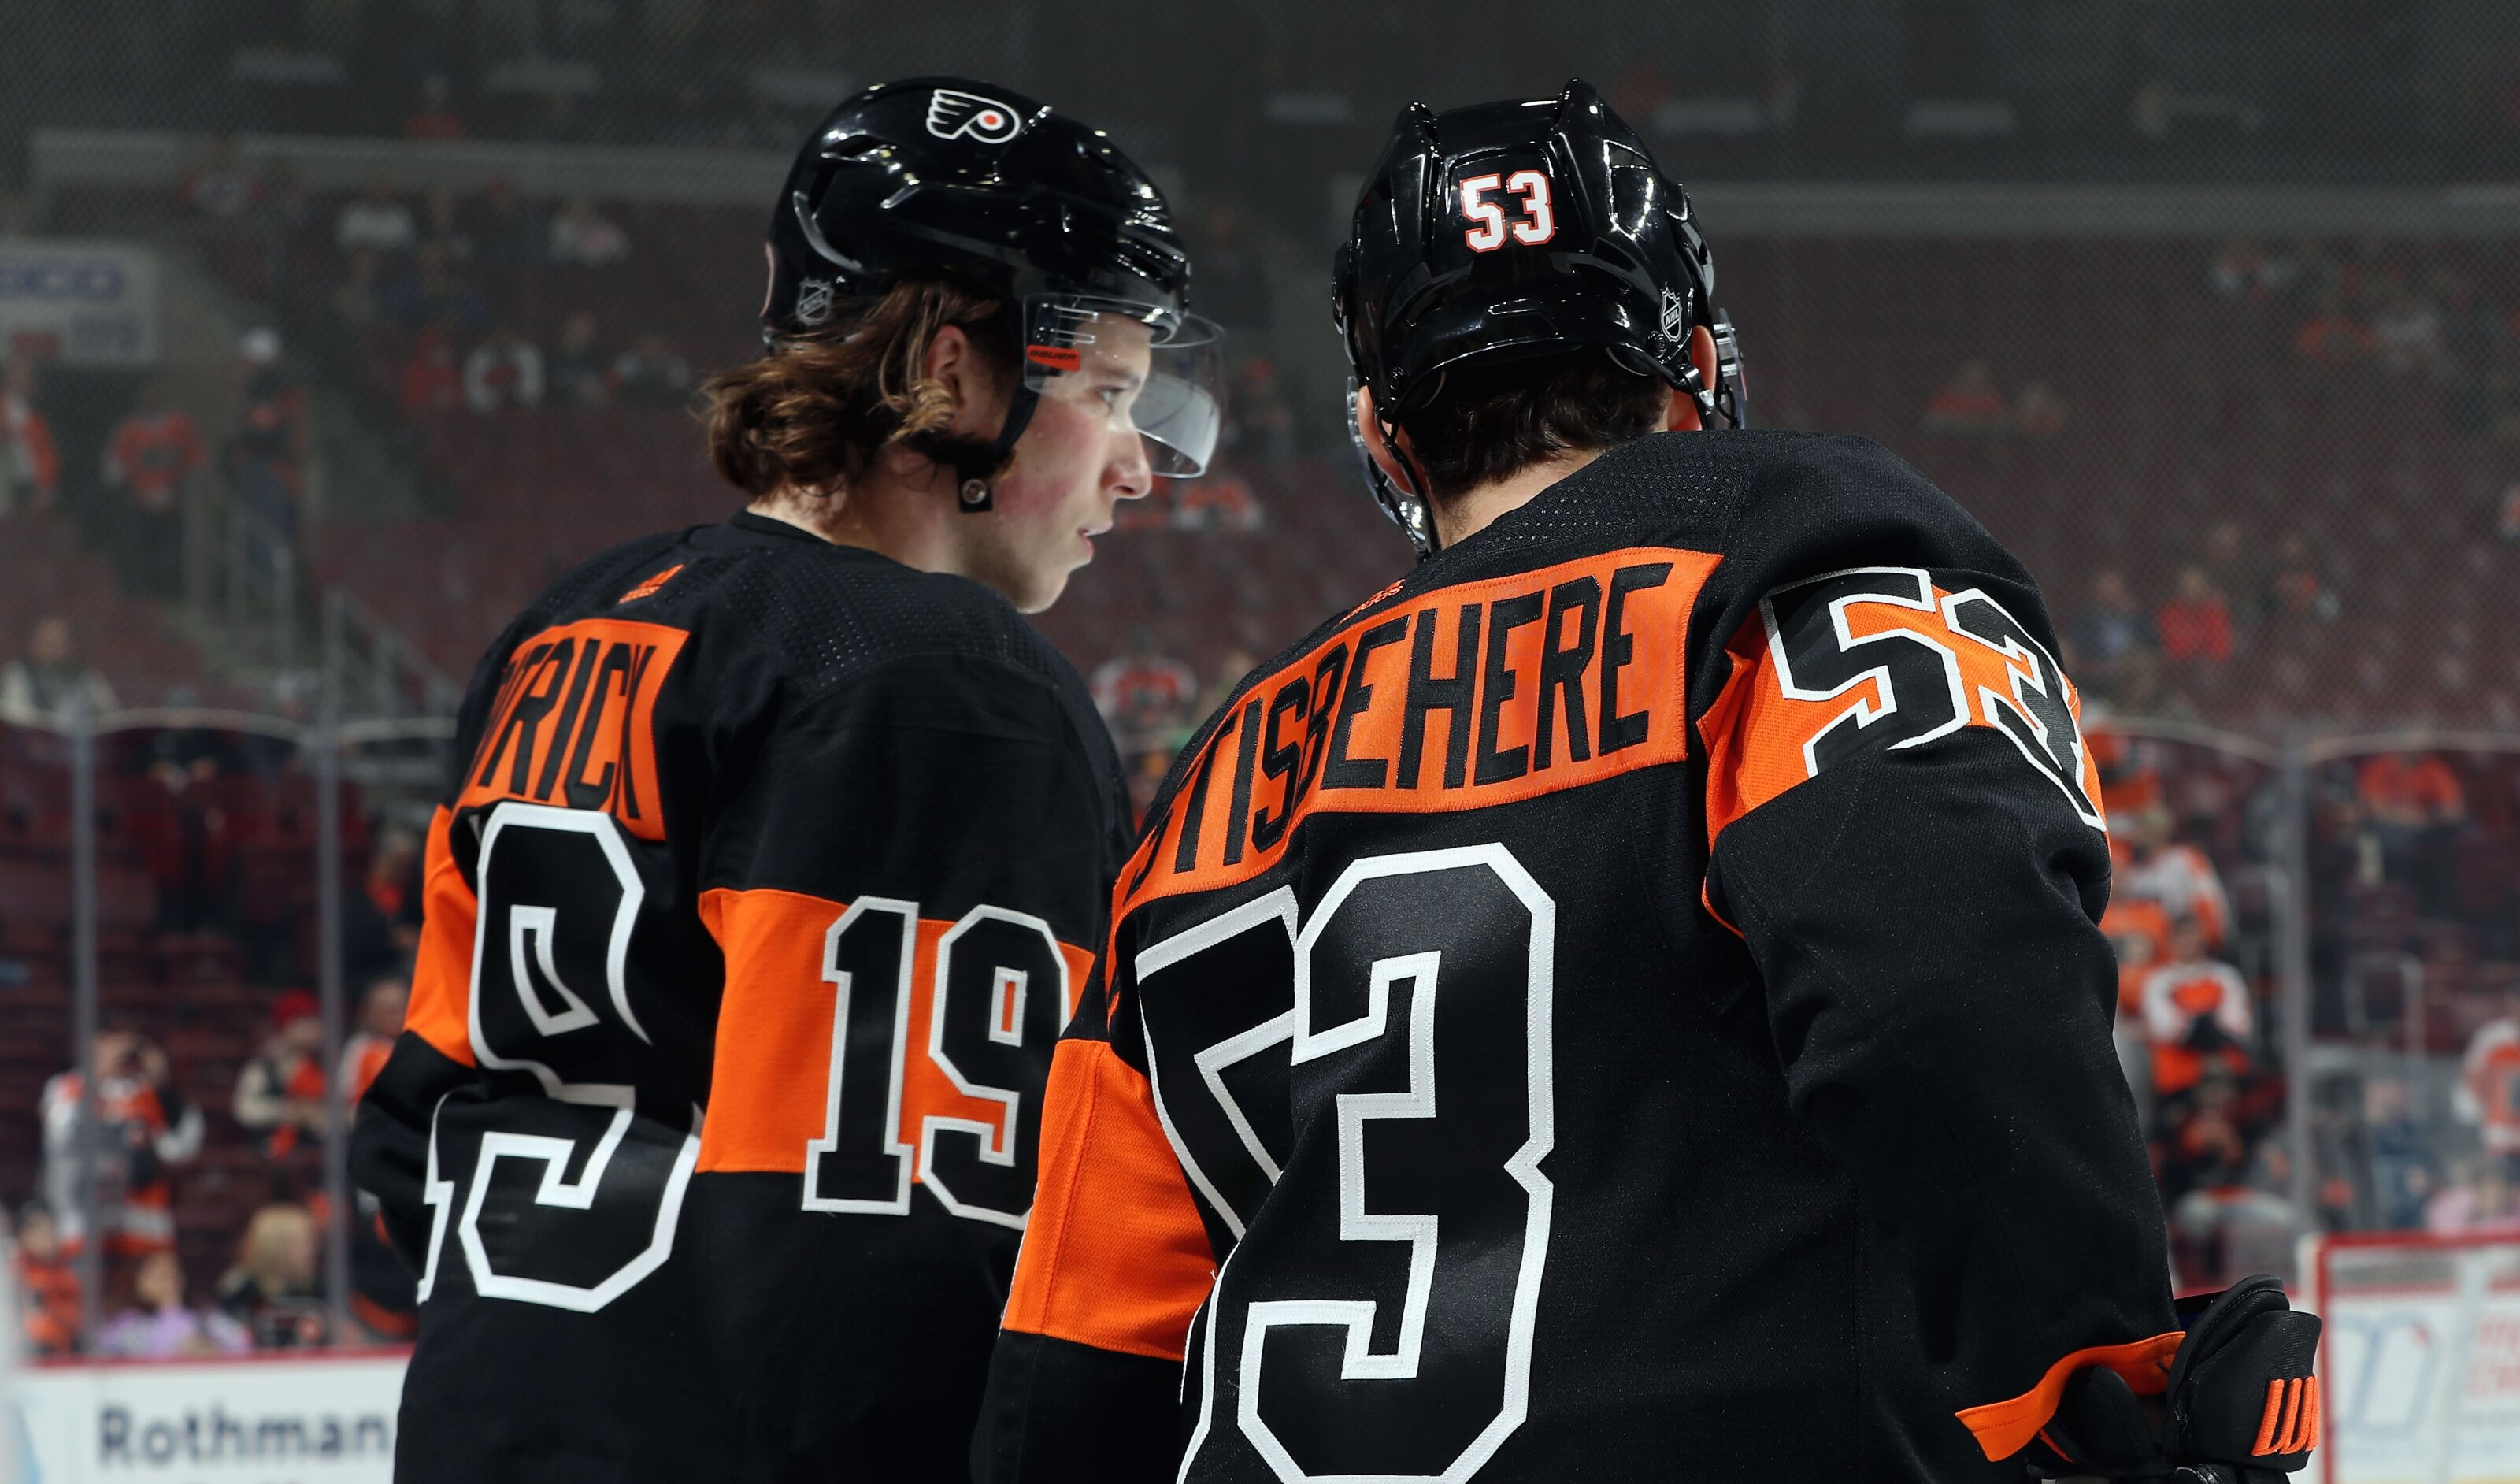 Patrick scores in return as Philadelphia Flyers defeat the Devils 5-2